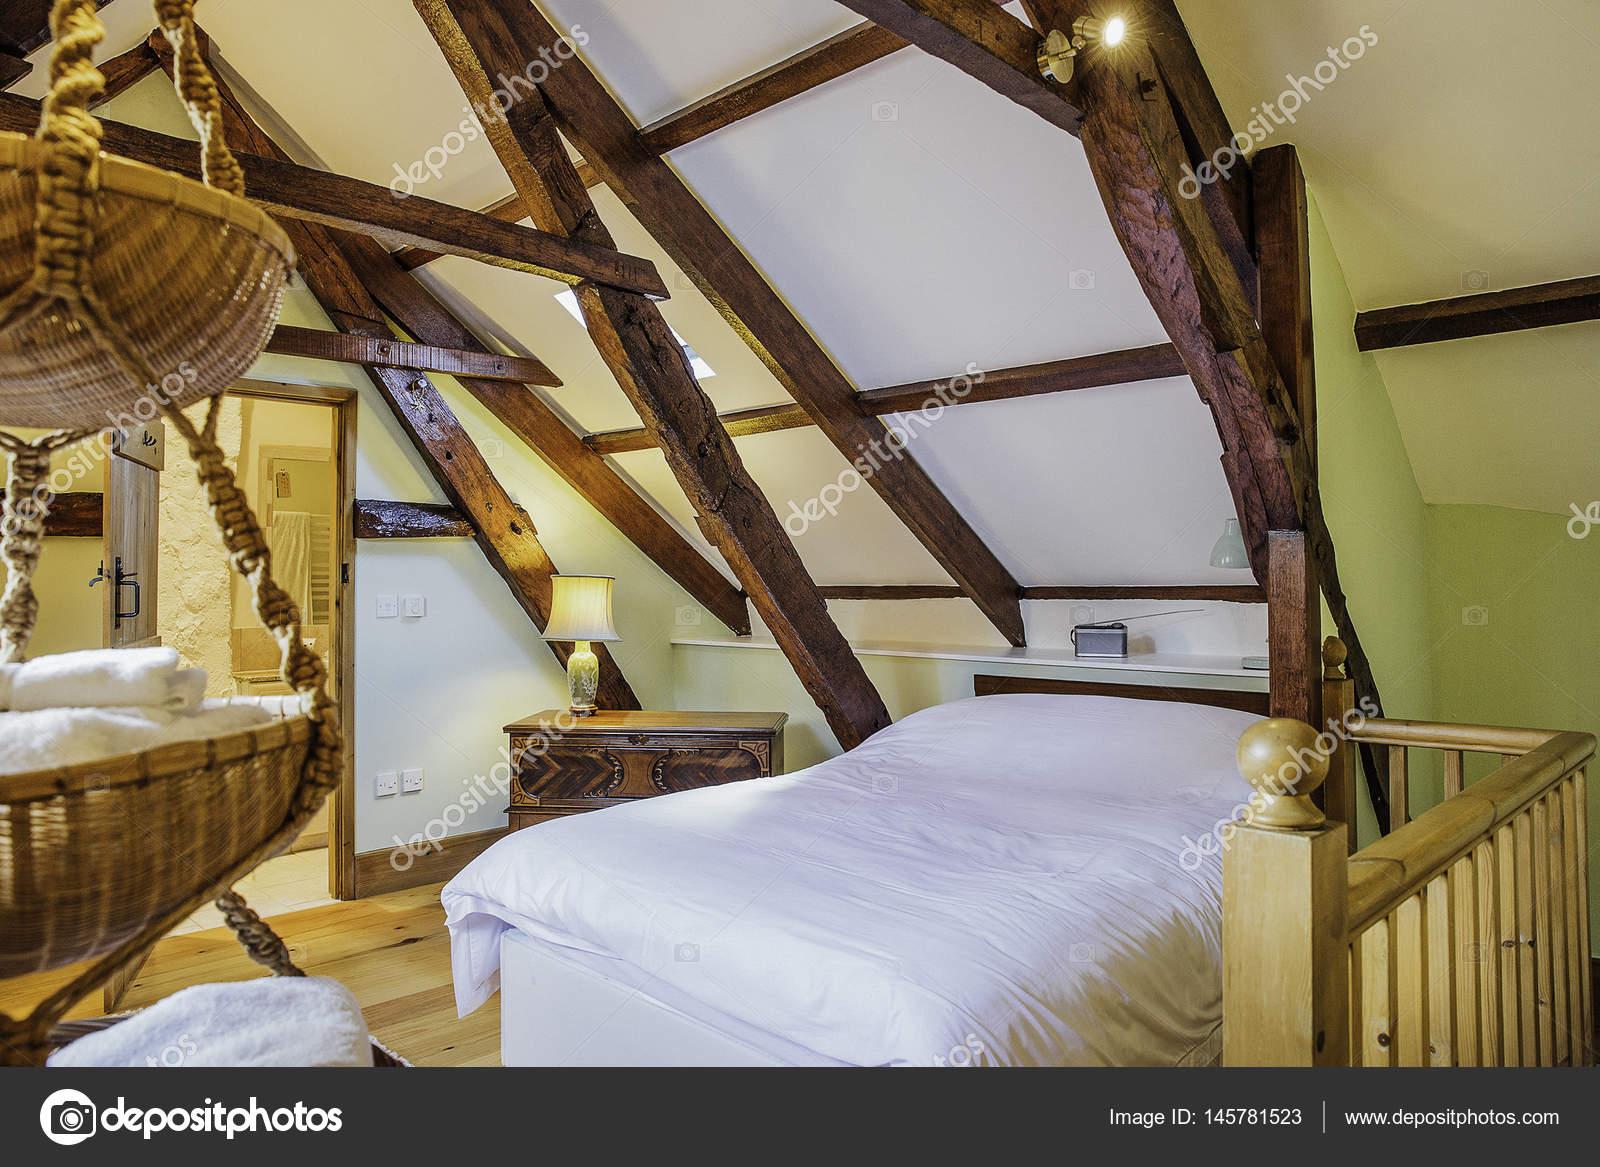 Log Cabin Bedroom Stock Photo C Dglimages 145781523